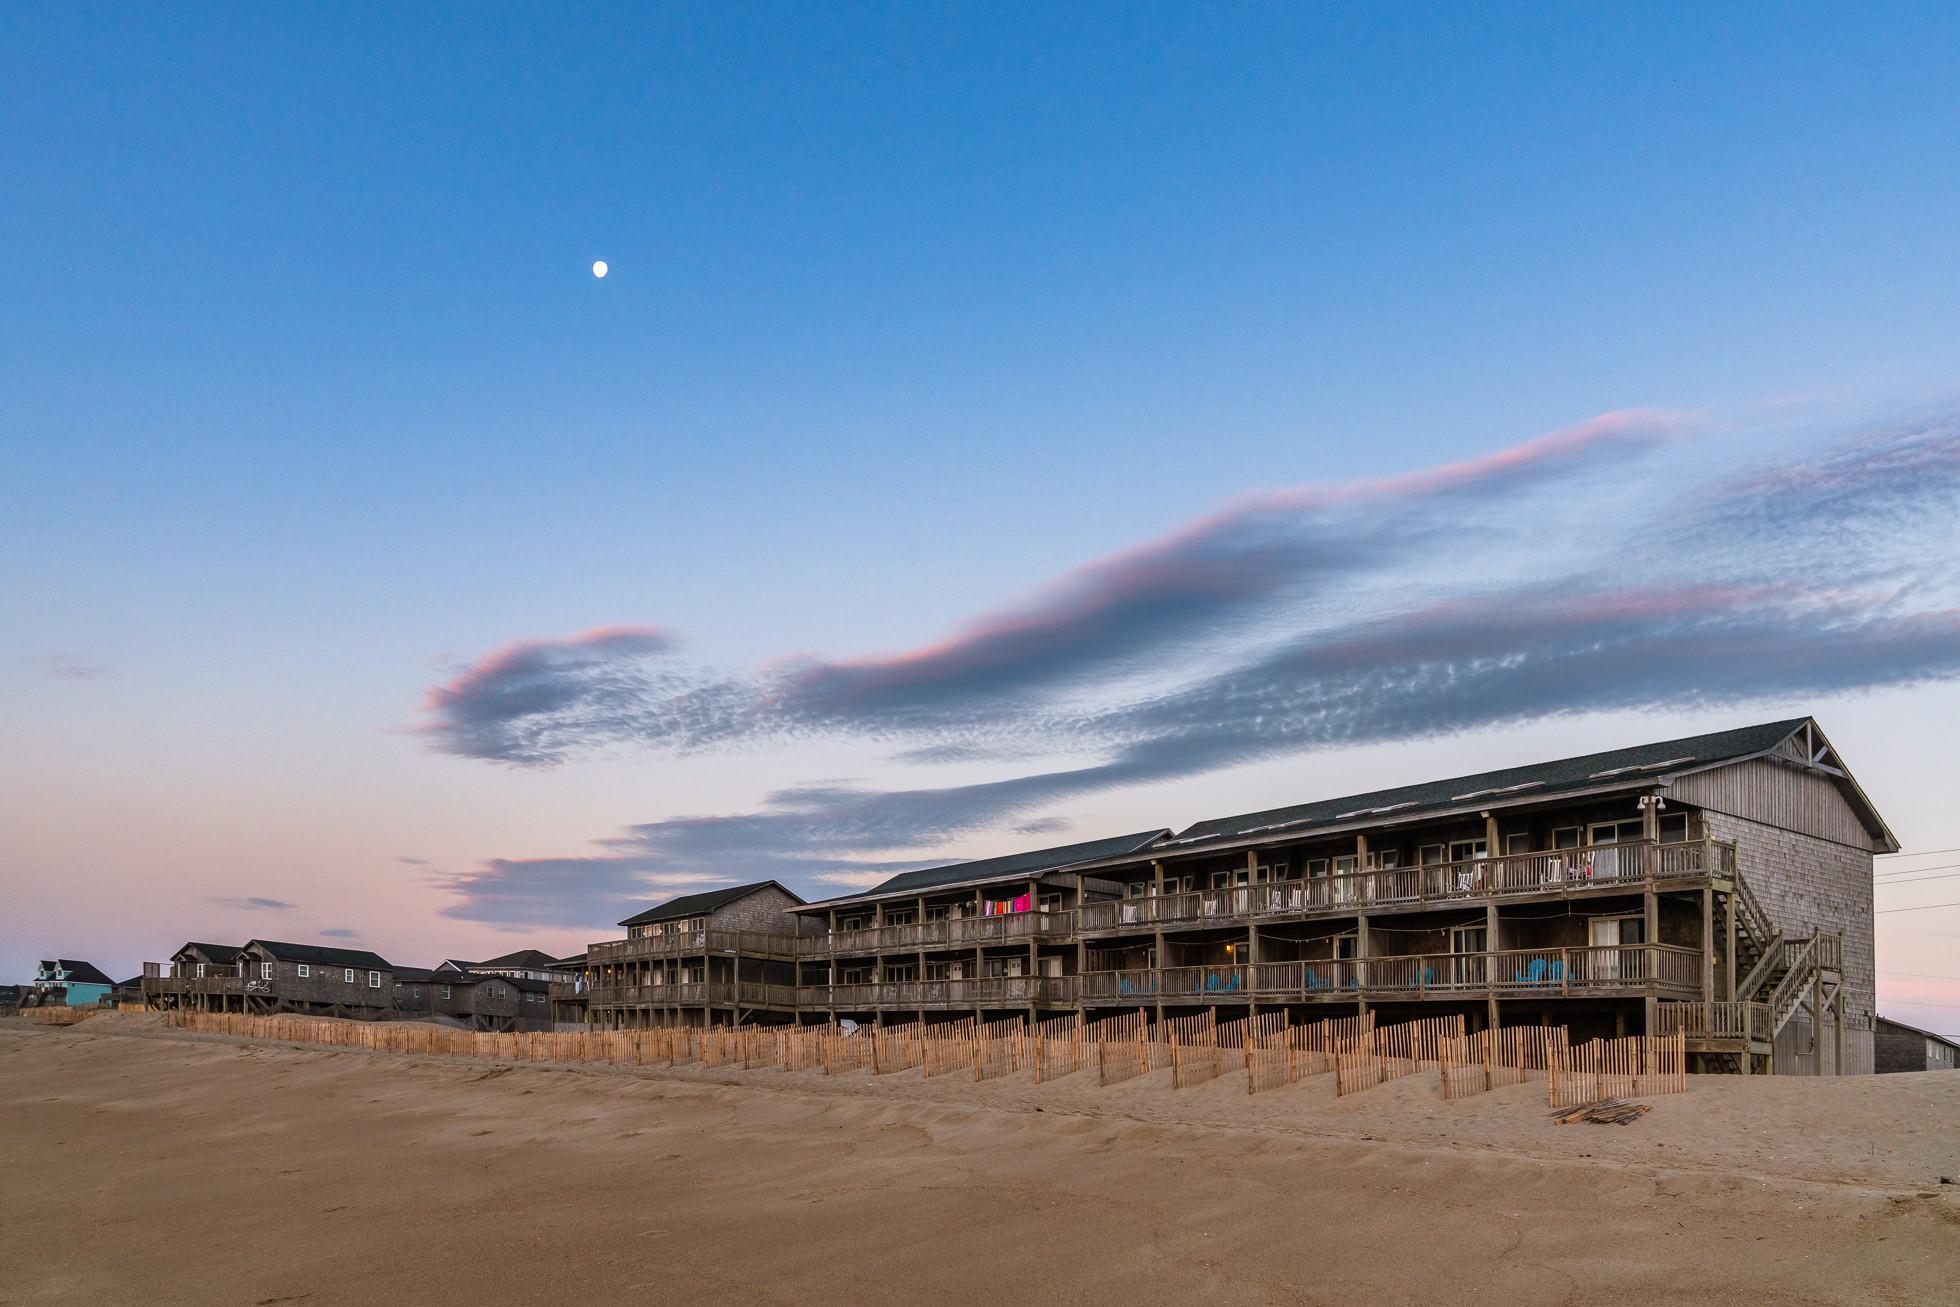 Sunrise at the cape hatteras motel buxton outer banks North Carolina